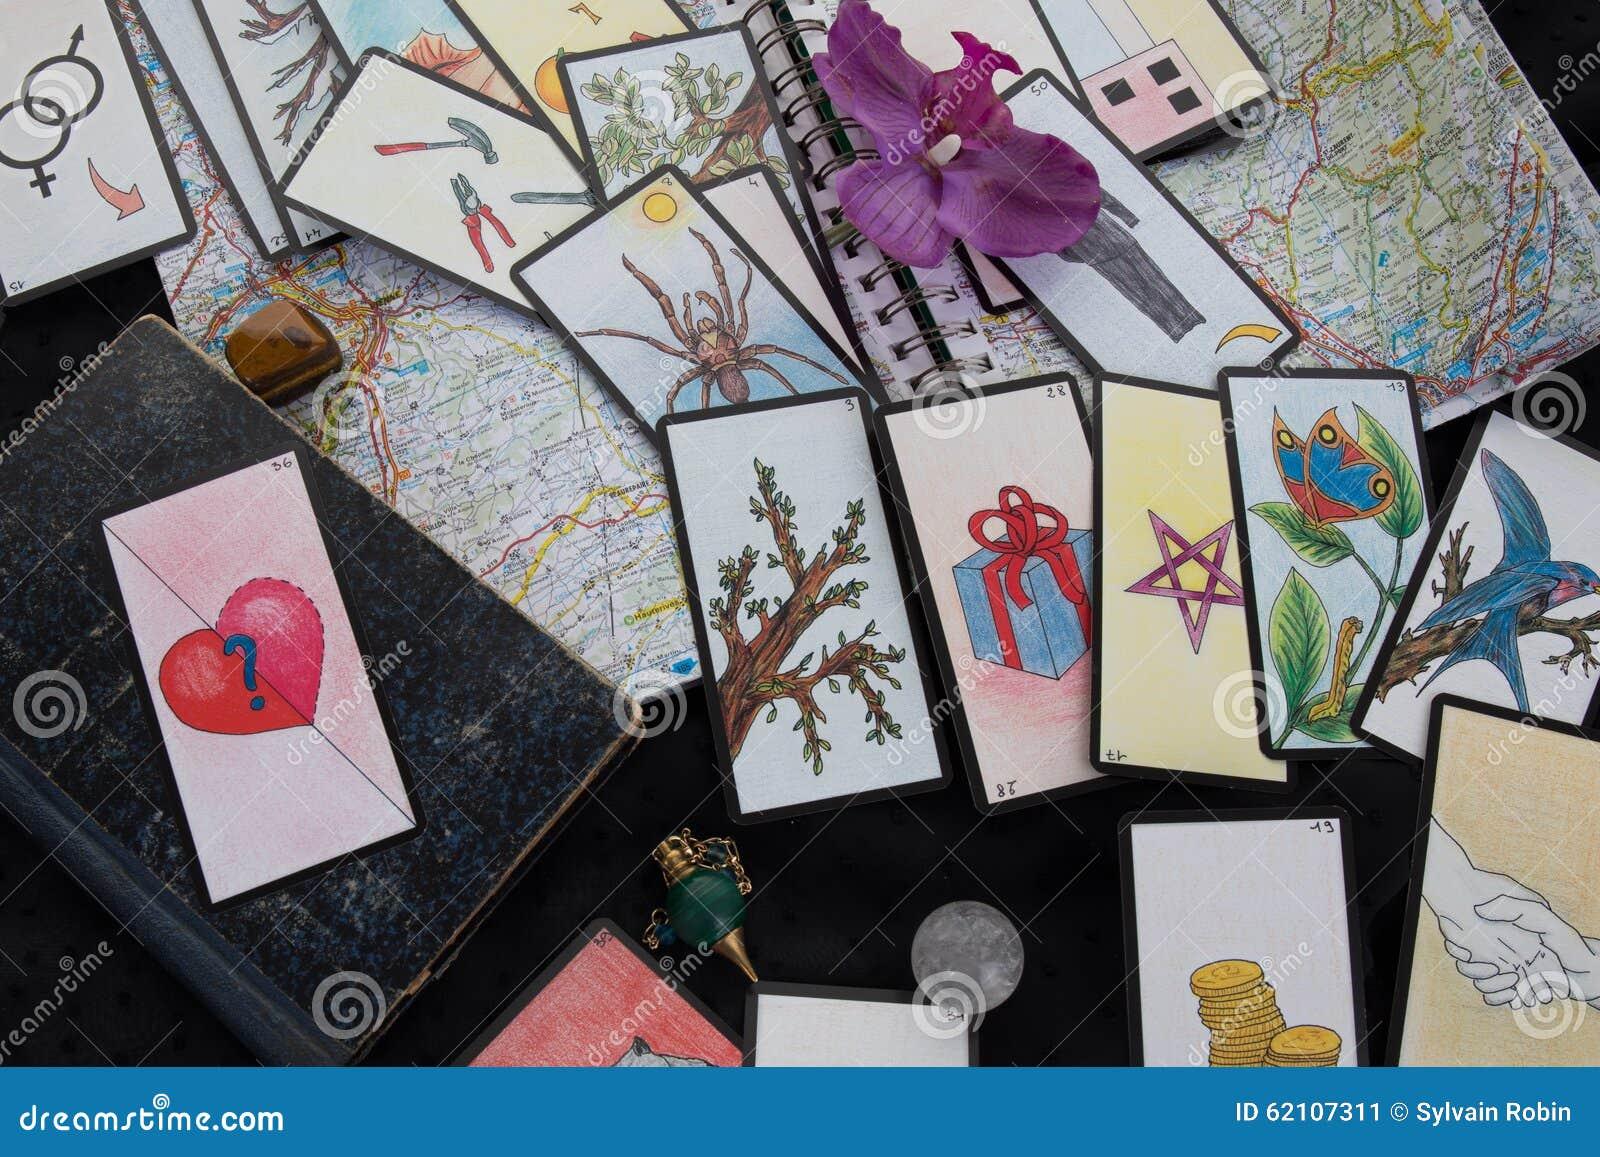 Table ésotérique Avec La Roue Astrologique, Pendule Magique, Tarots ... b481b8dfee5